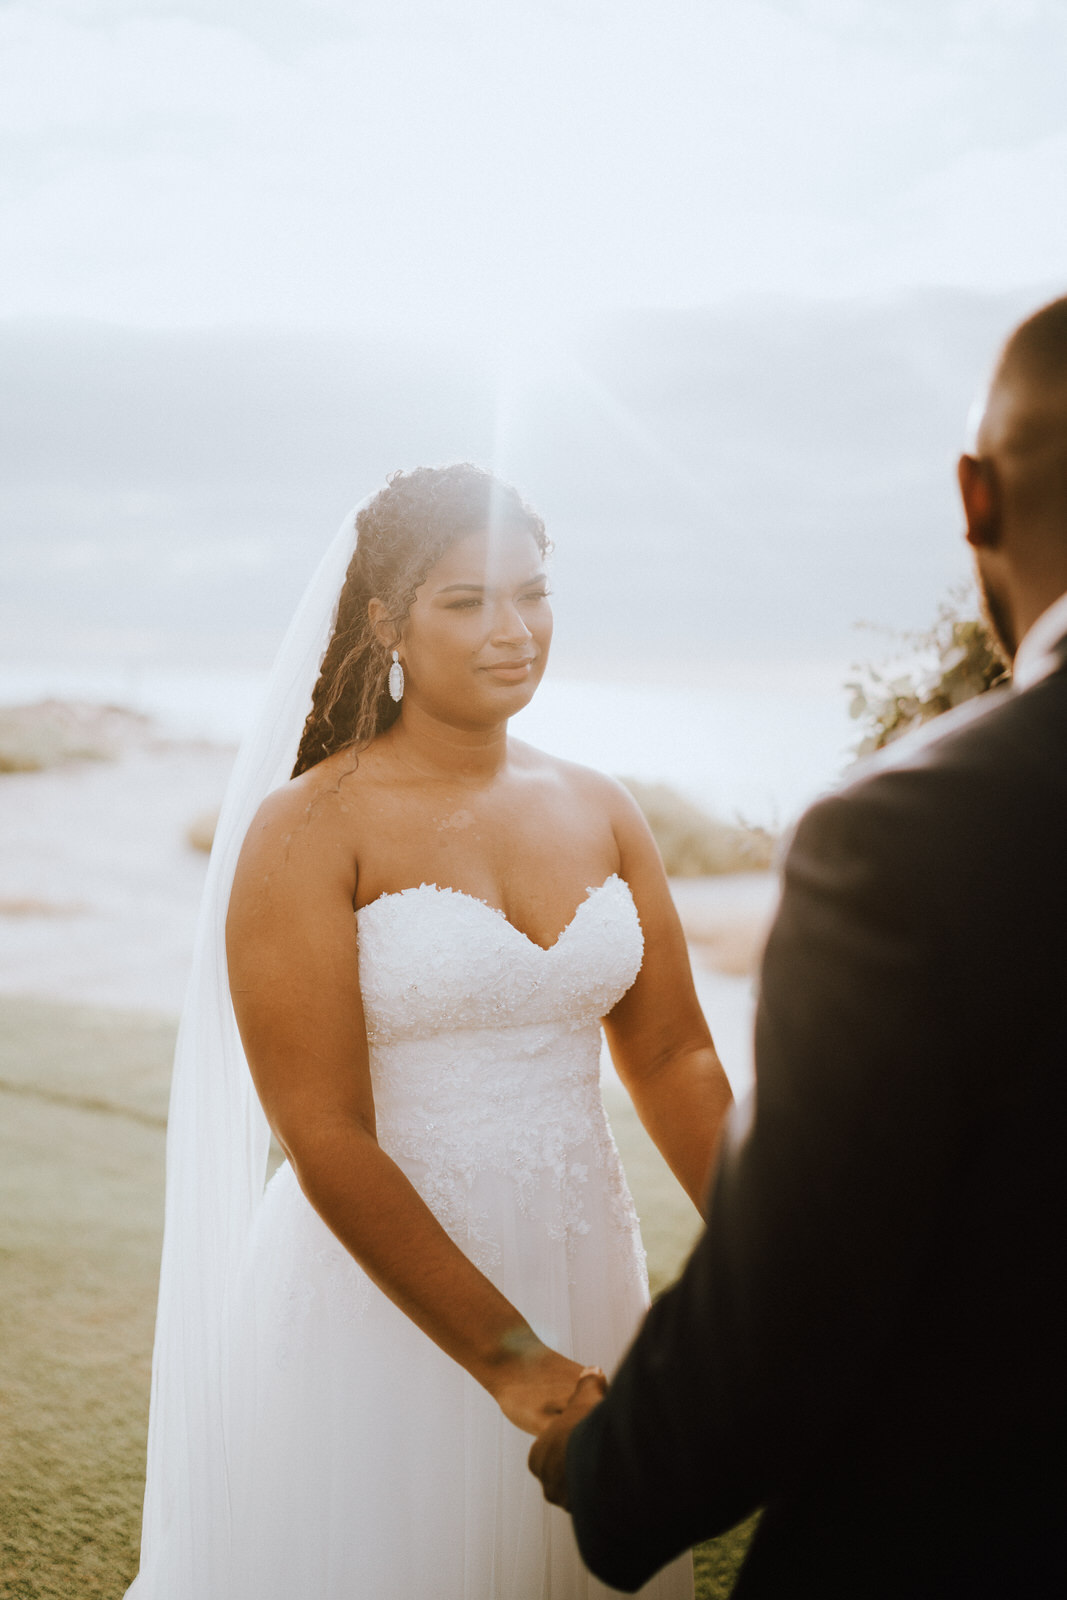 South Seas Island Resort Elopement- Alyana and Shawn- Michelle Gonzalez Photography-459.JPG